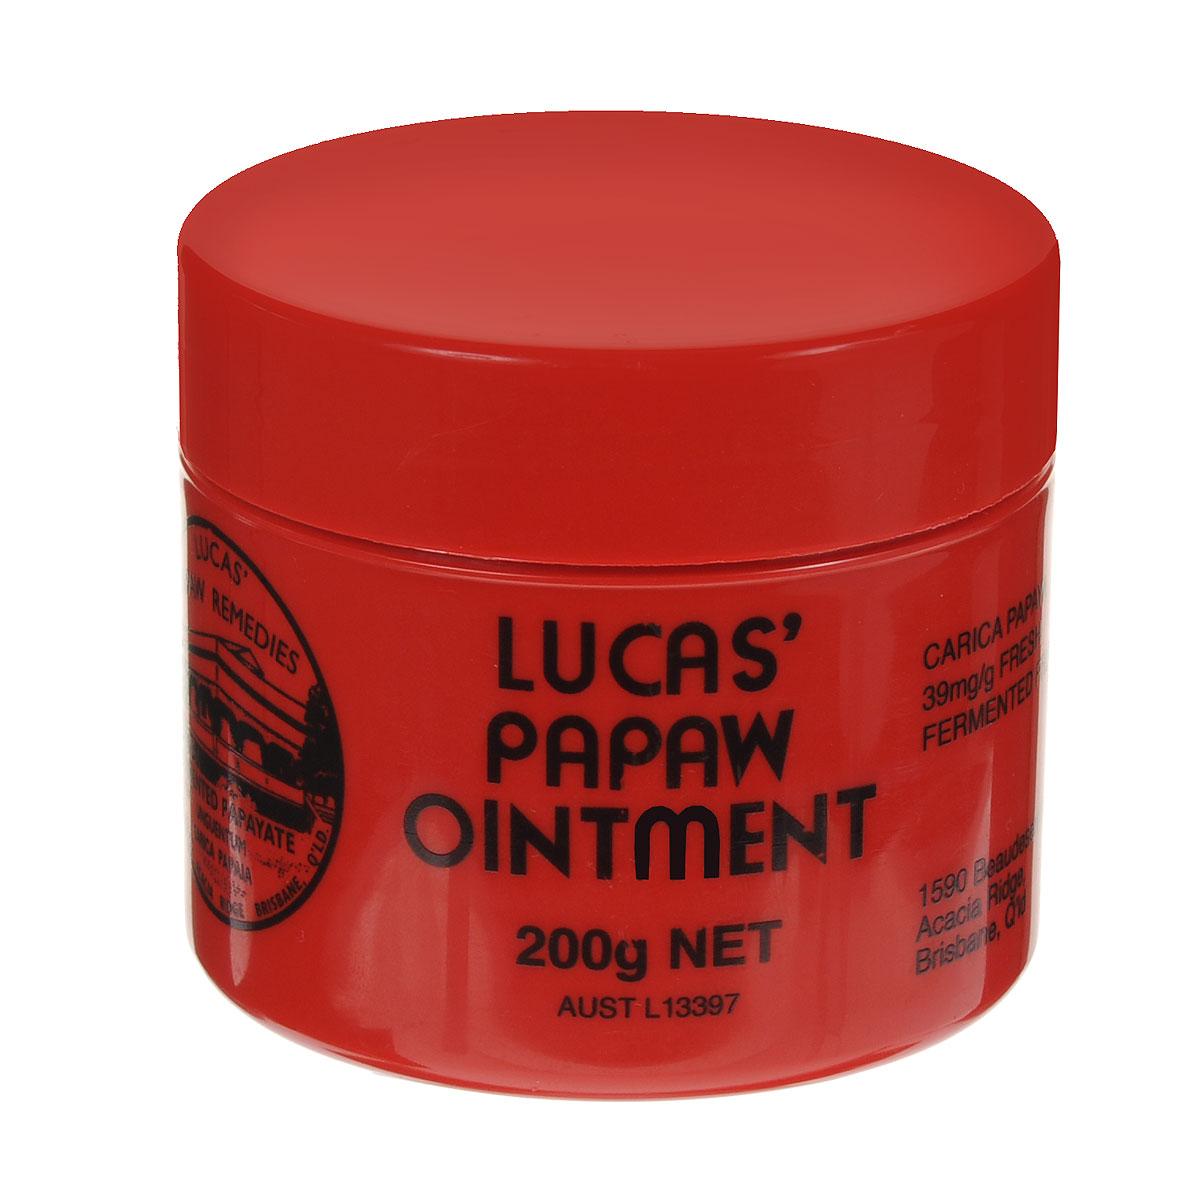 Lucas Papaw Бальзам для губ Ointment, 200 г4